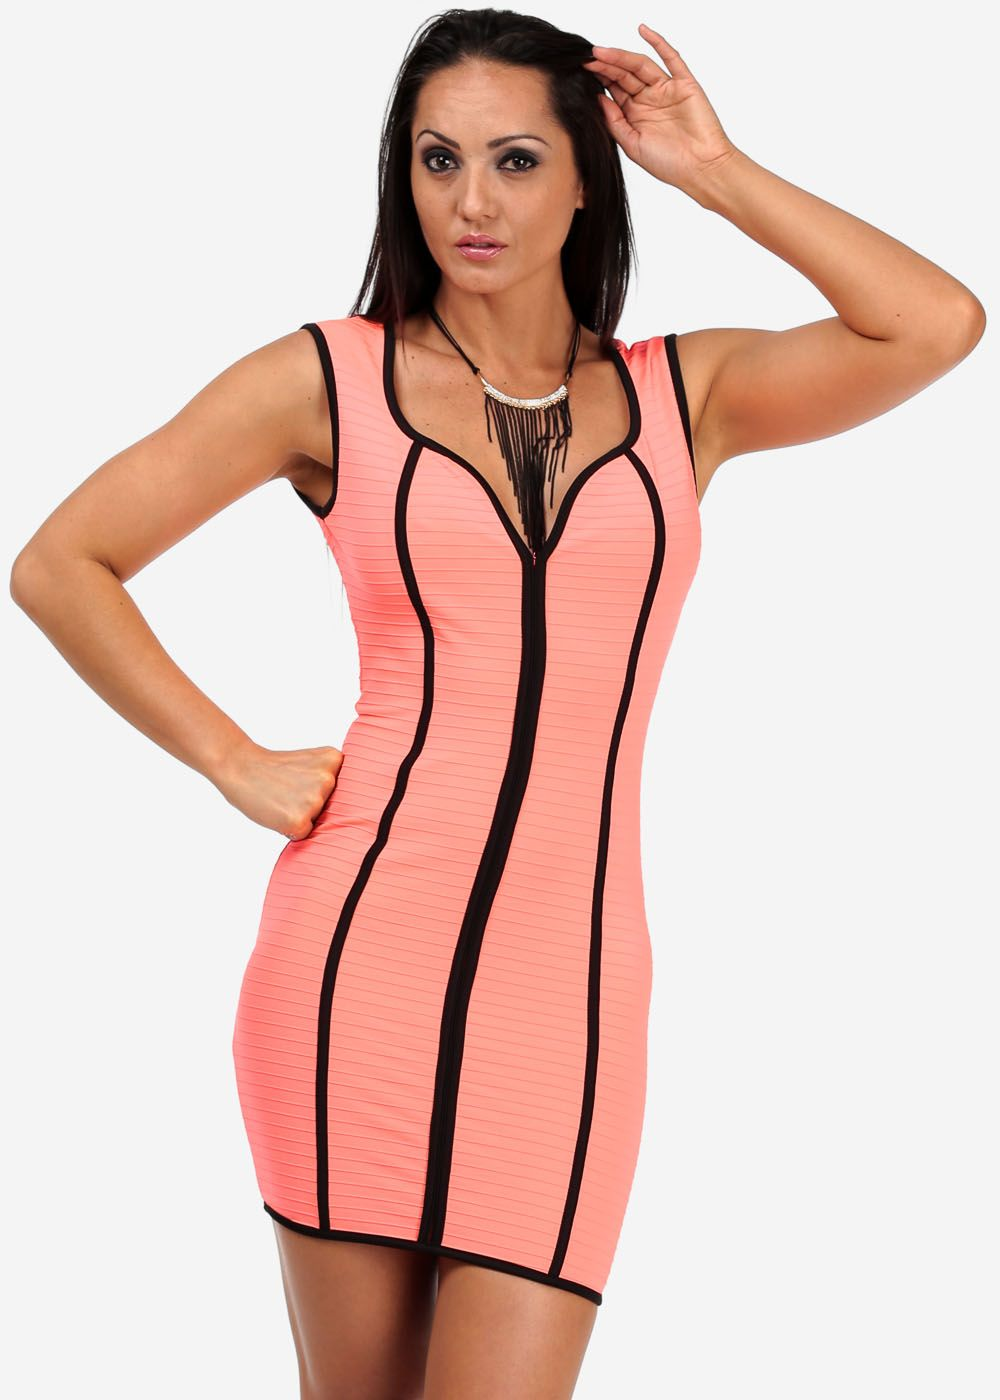 Fashion Dresses-Cute Retro Dress-Neon bodycon dress